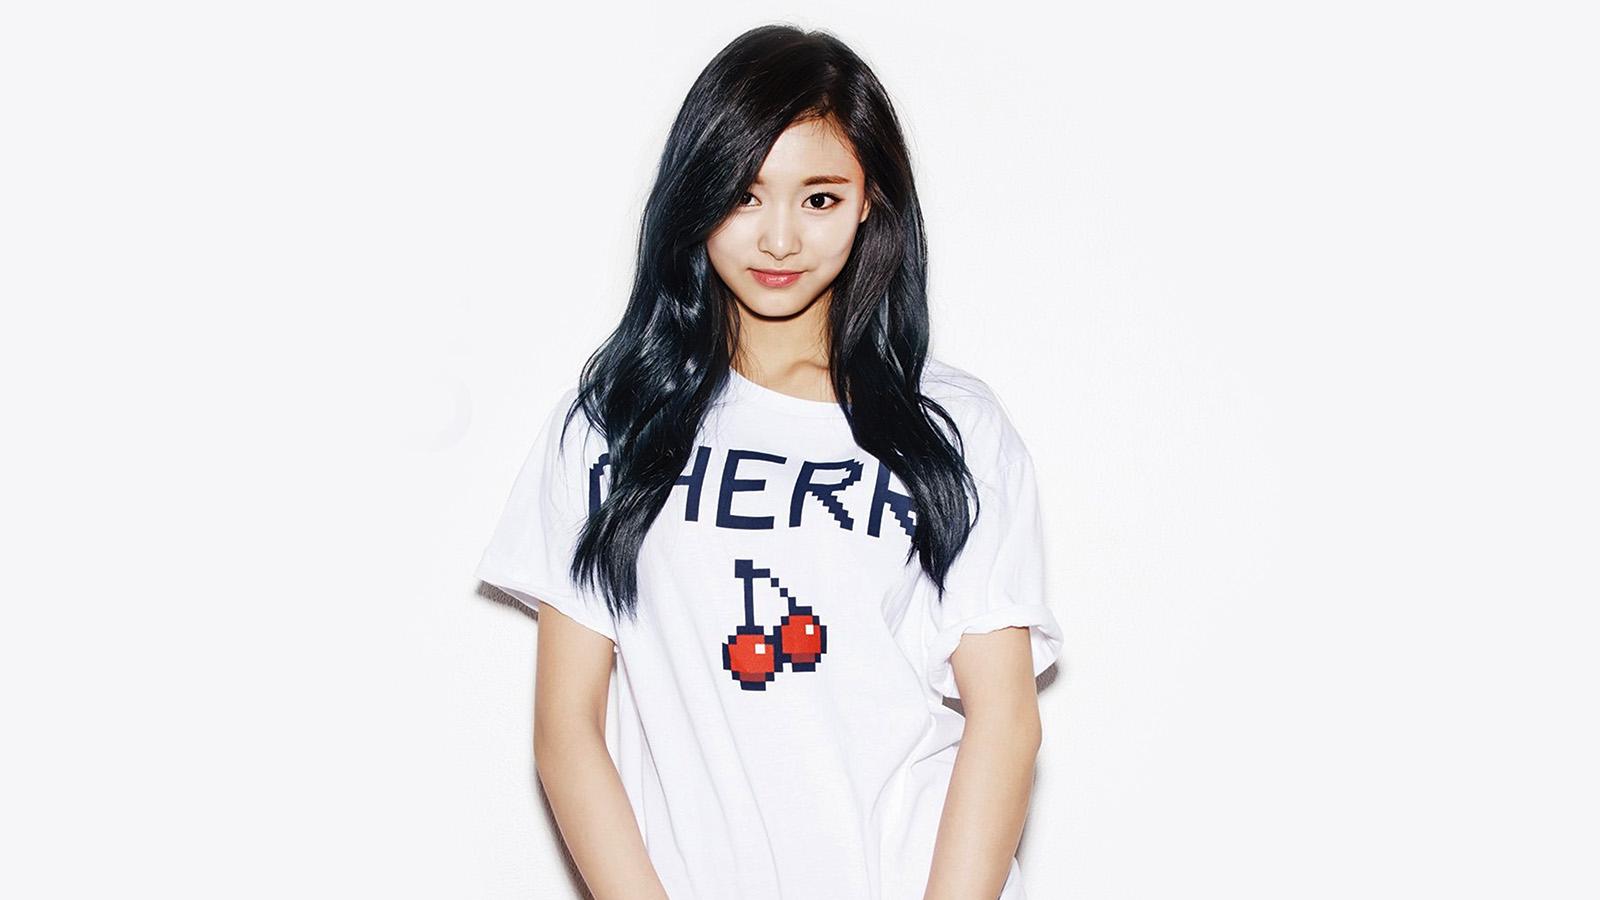 Papers Co Desktop Wallpaper Hi70 Kpop Tzuyu Oh Boy Cute Asian Twice